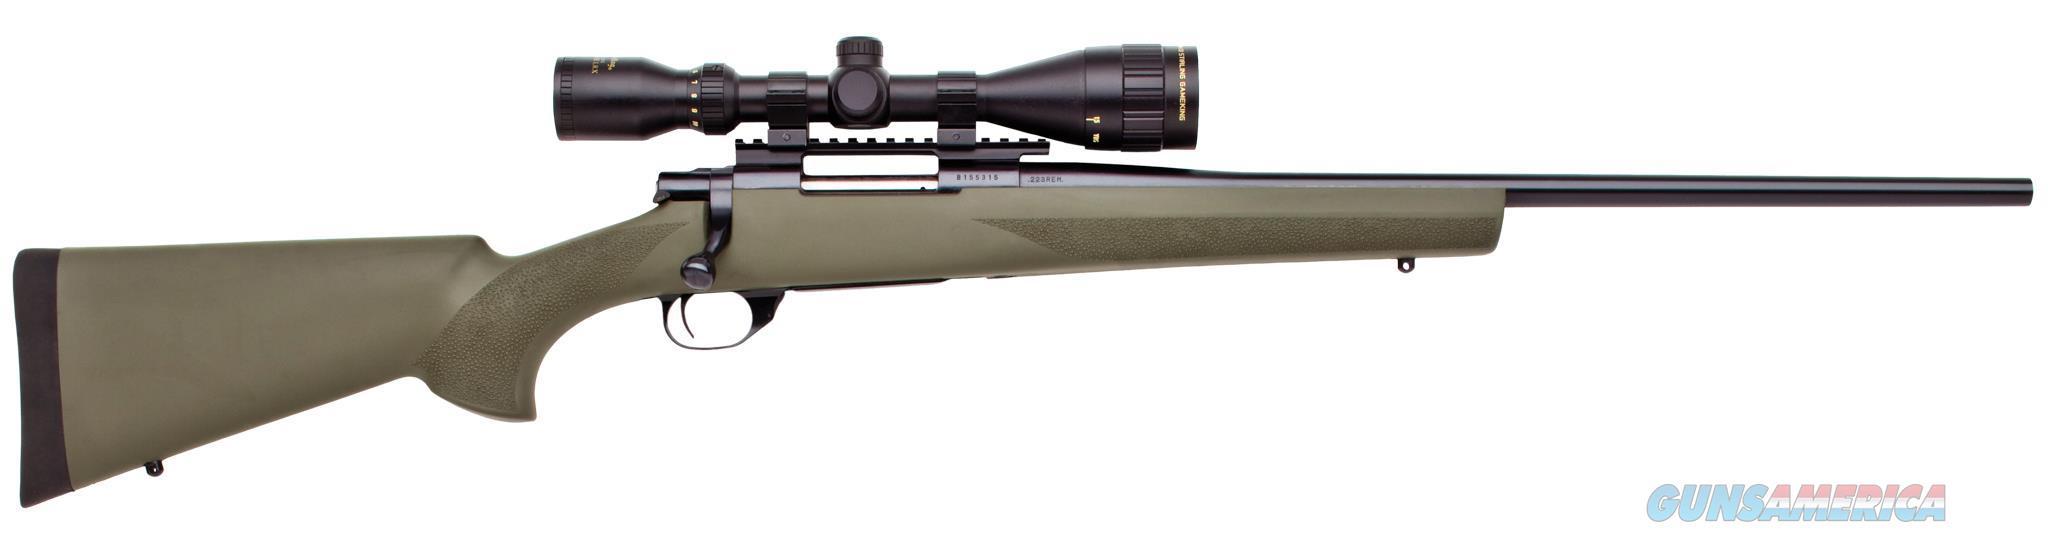 "Howa Hgk60208+ Hogue Gameking Scope Package Bolt 223 Remington 22"" 5+1 Hogue Overmolded Green Stk Blued HGK60208  Guns > Rifles > L Misc Rifles"